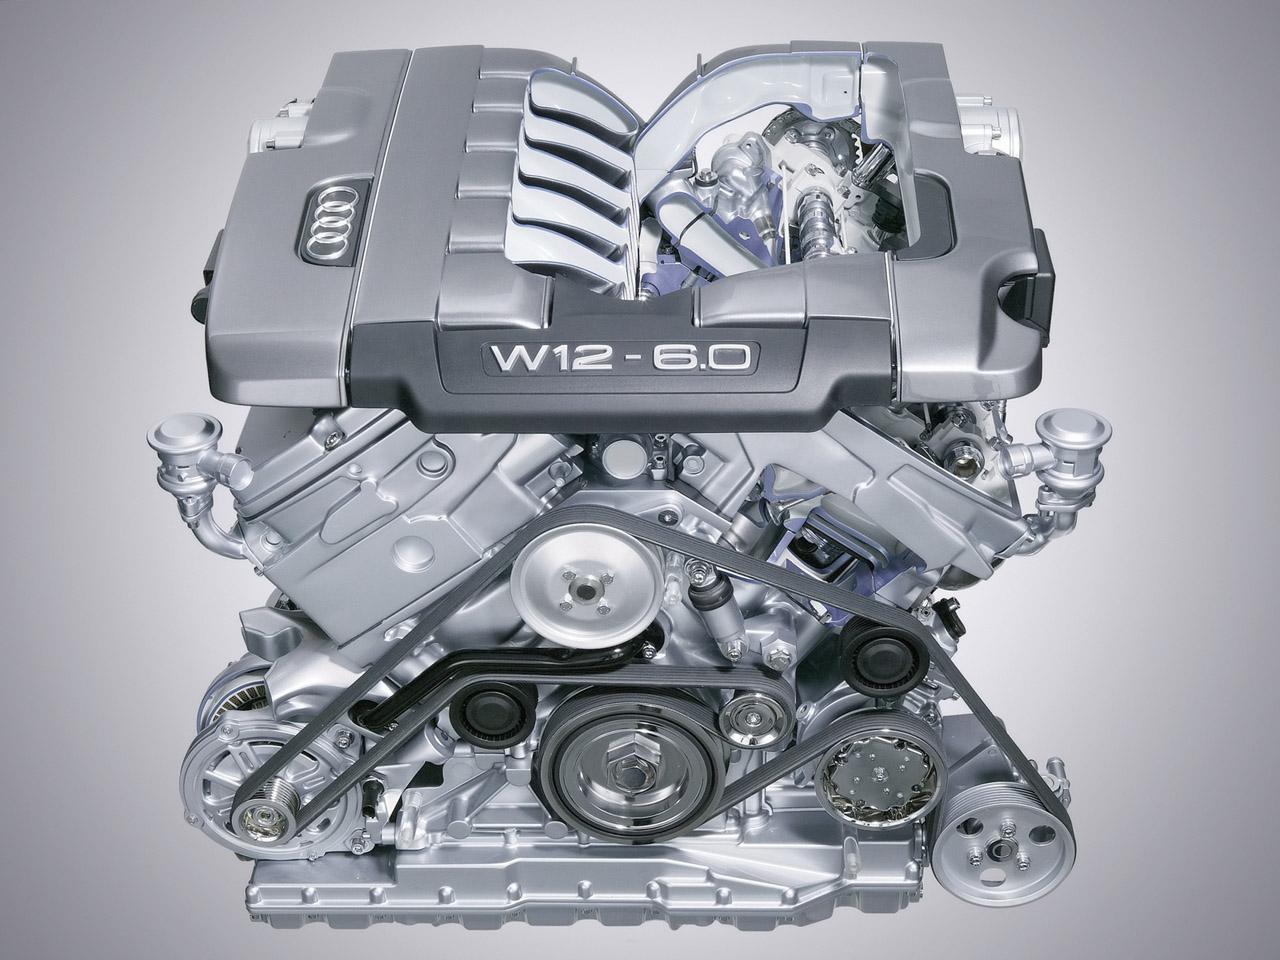 Bugatti W16 Engine together with Bugatti New Model 2016 likewise 2017 Chevrolet Malibu likewise Audi W12 Engine Cutaway likewise Bugatti Engine Block. on w16 engine diagram